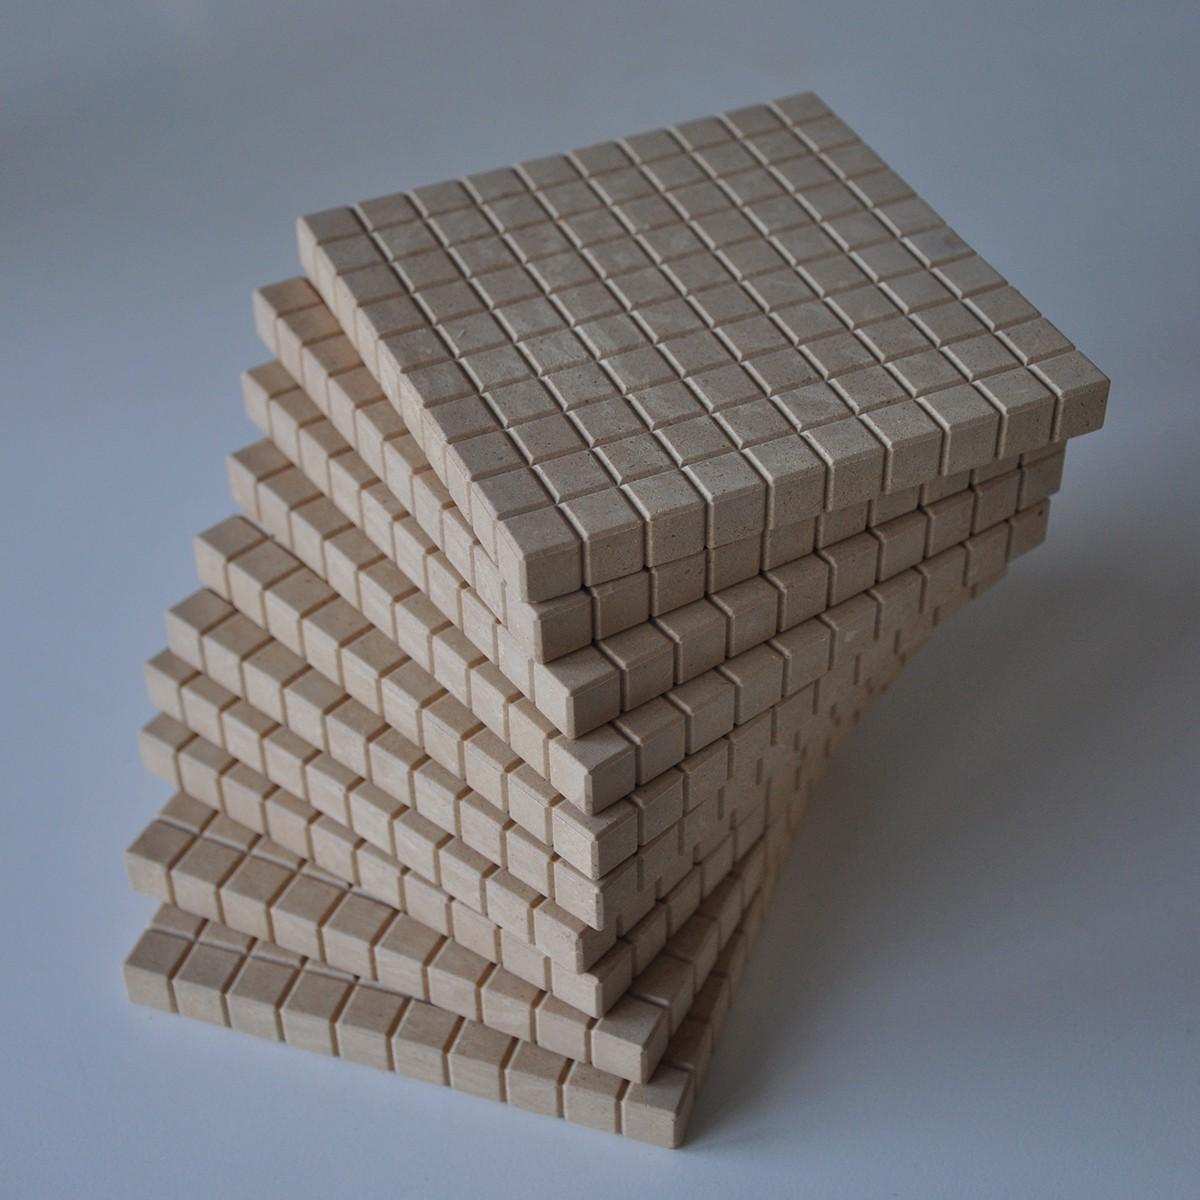 Bas10 RE-wood,10 hundraplattor